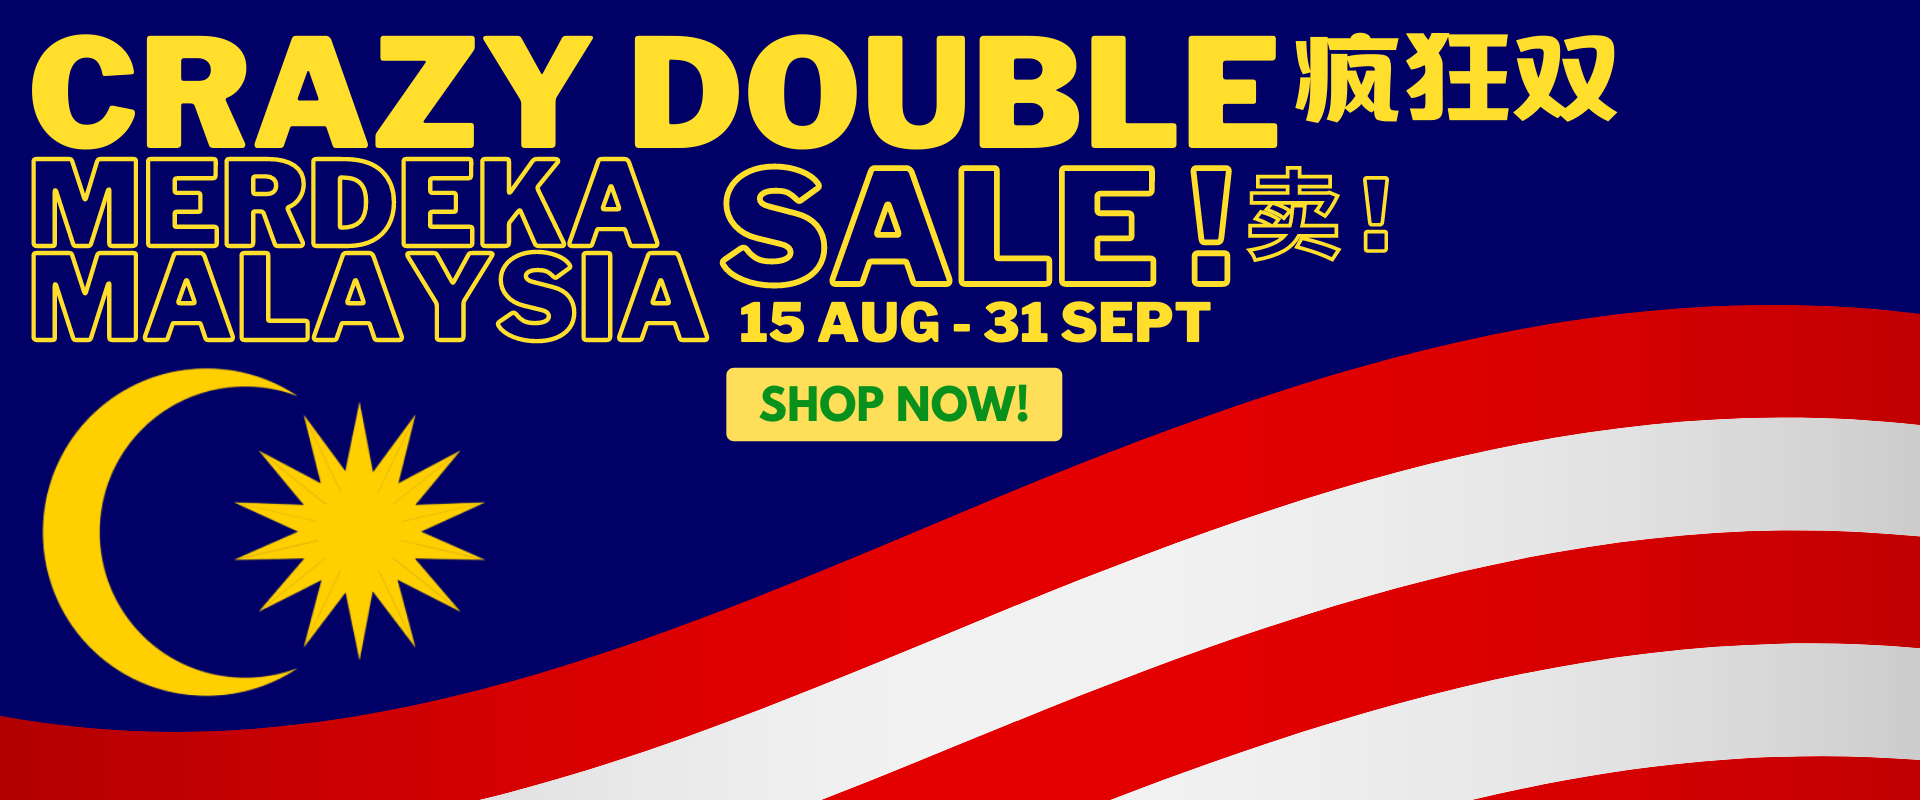 Crazy Double Merdeka & Malaysia Sale !